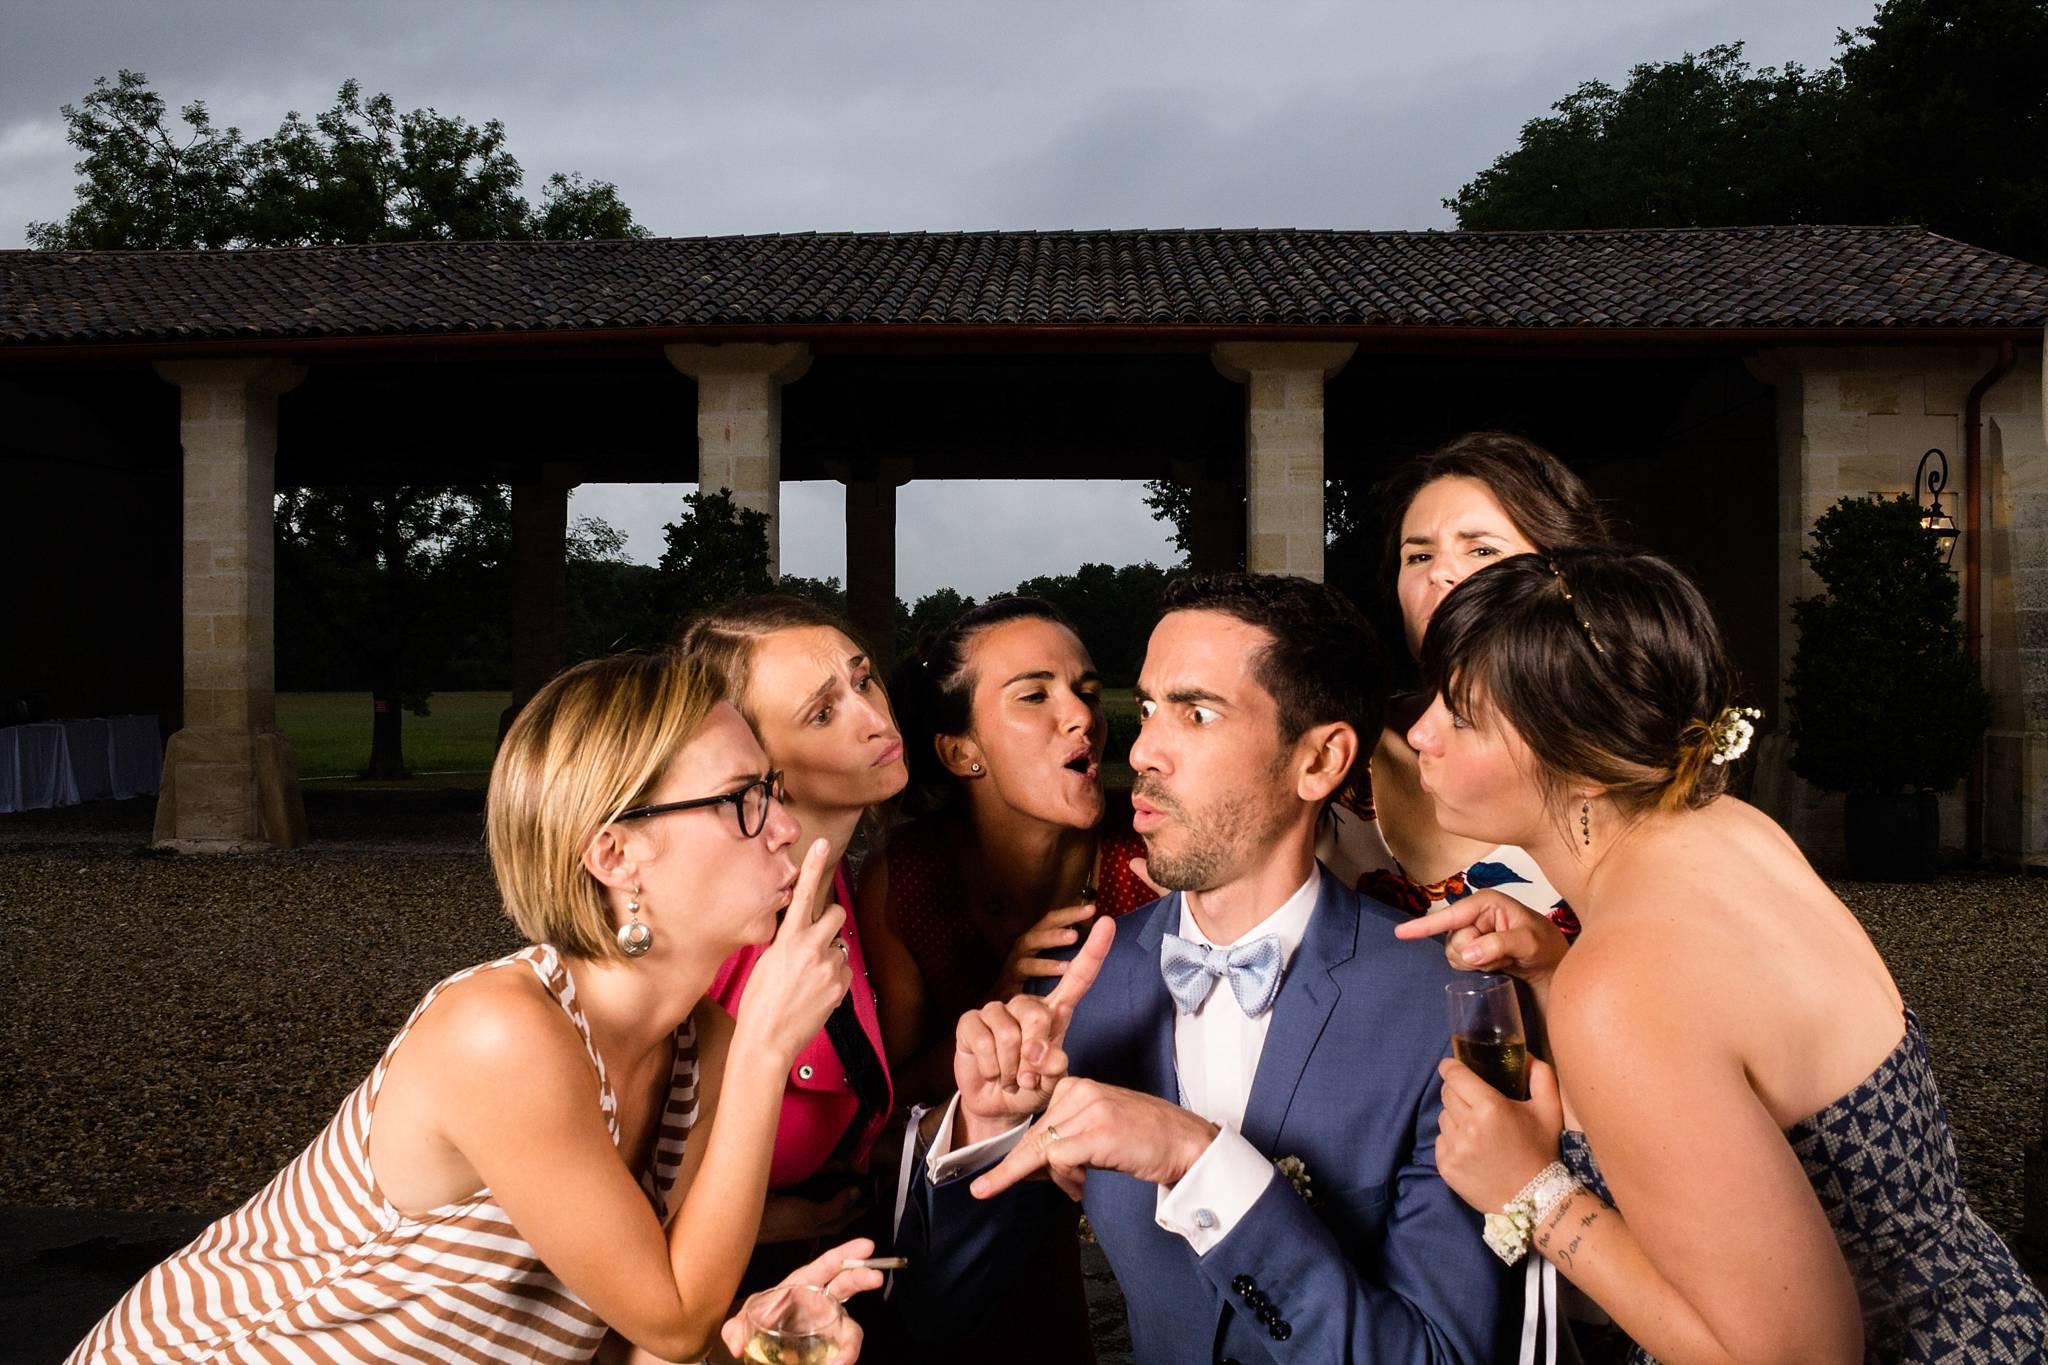 22_photobooth-mariage-bordeaux-gironde-dordogne-charentes-alexandre-roschewitz-photographies_2048px